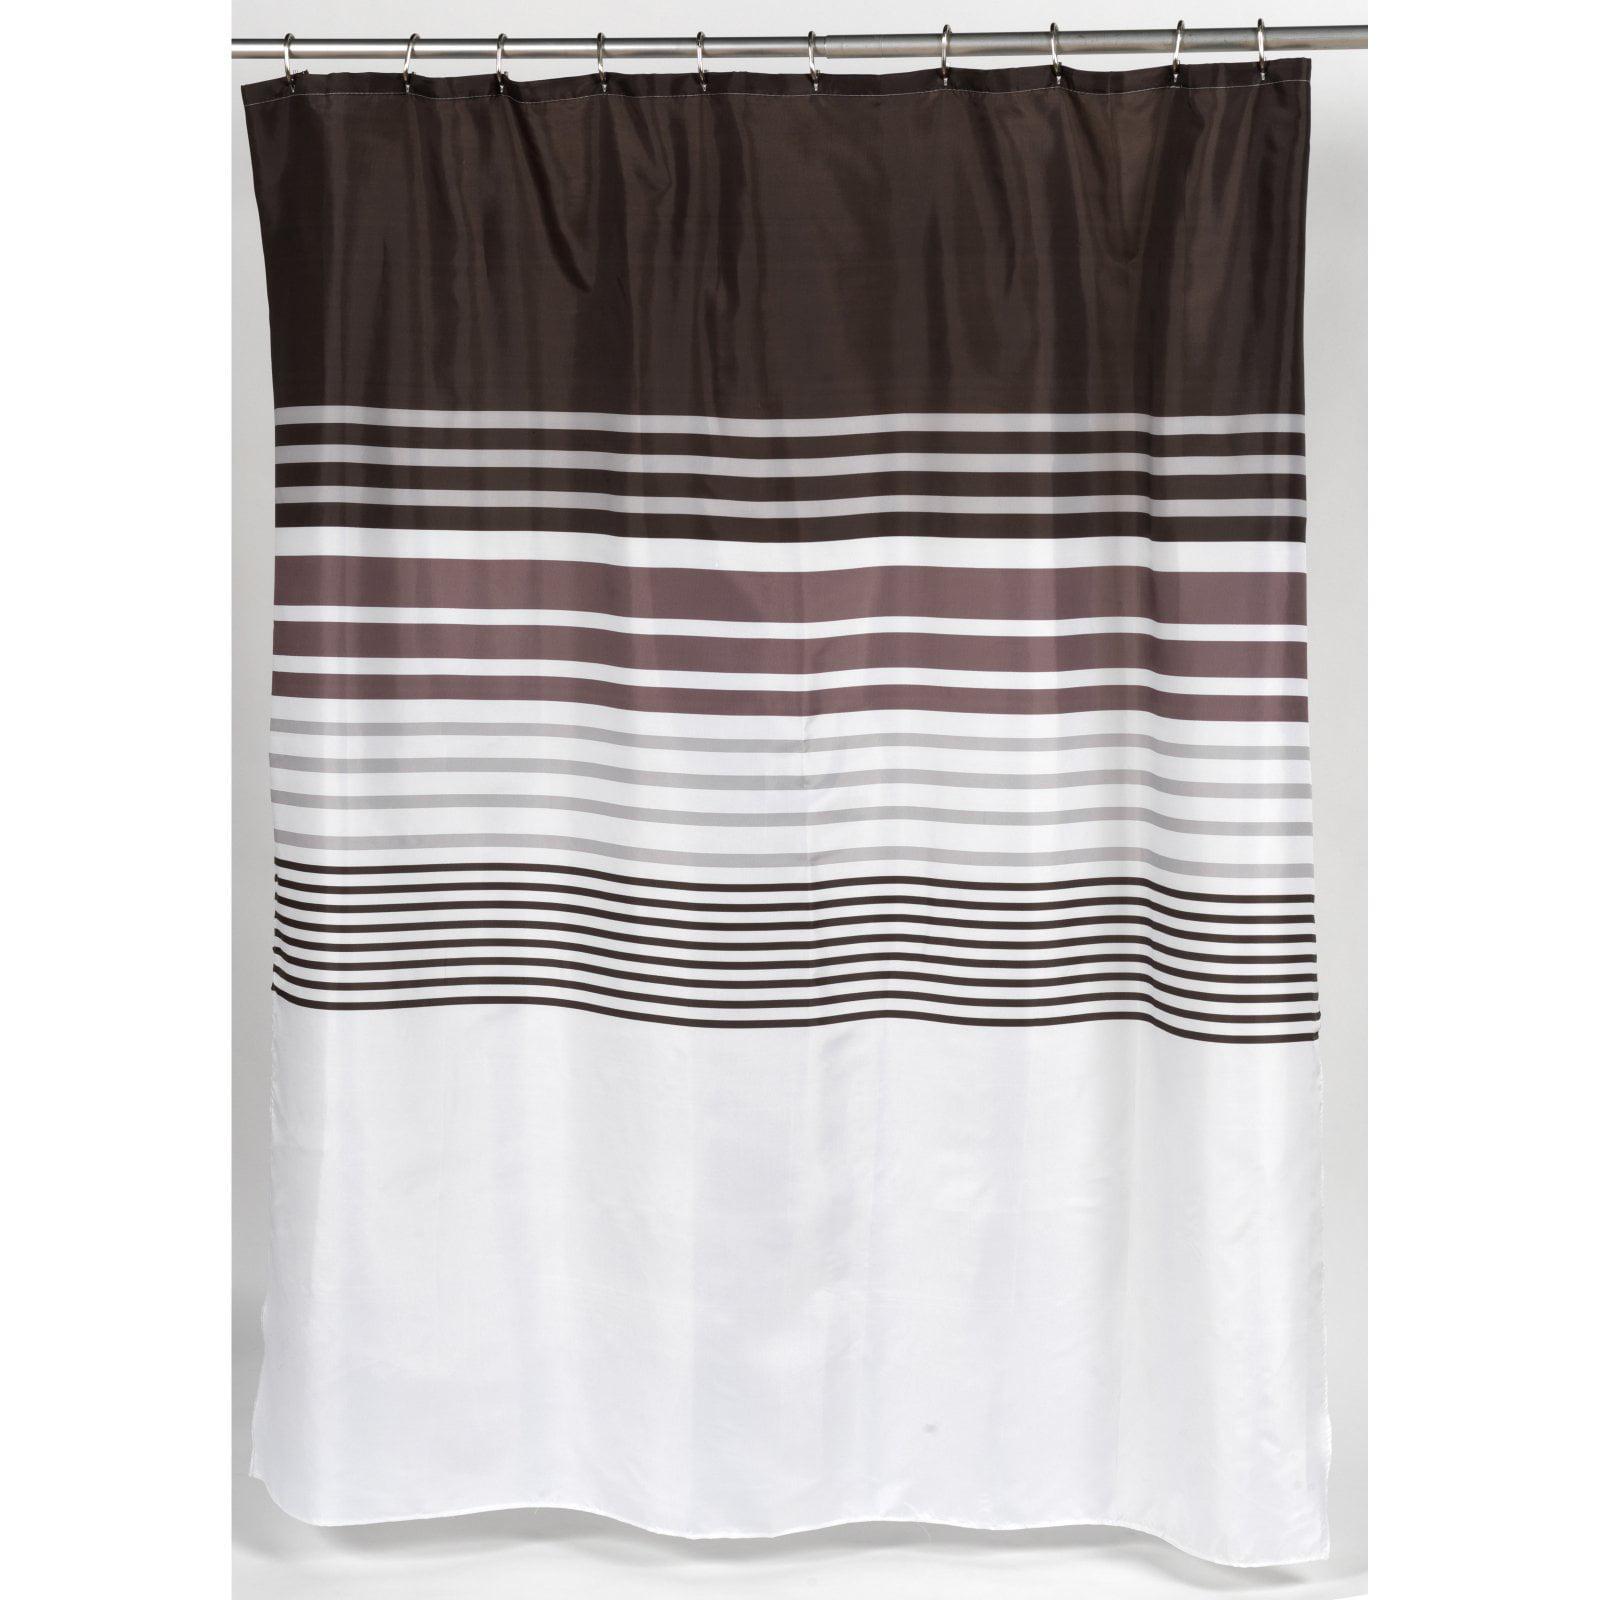 "Christina"" Fabric Shower Curtain"